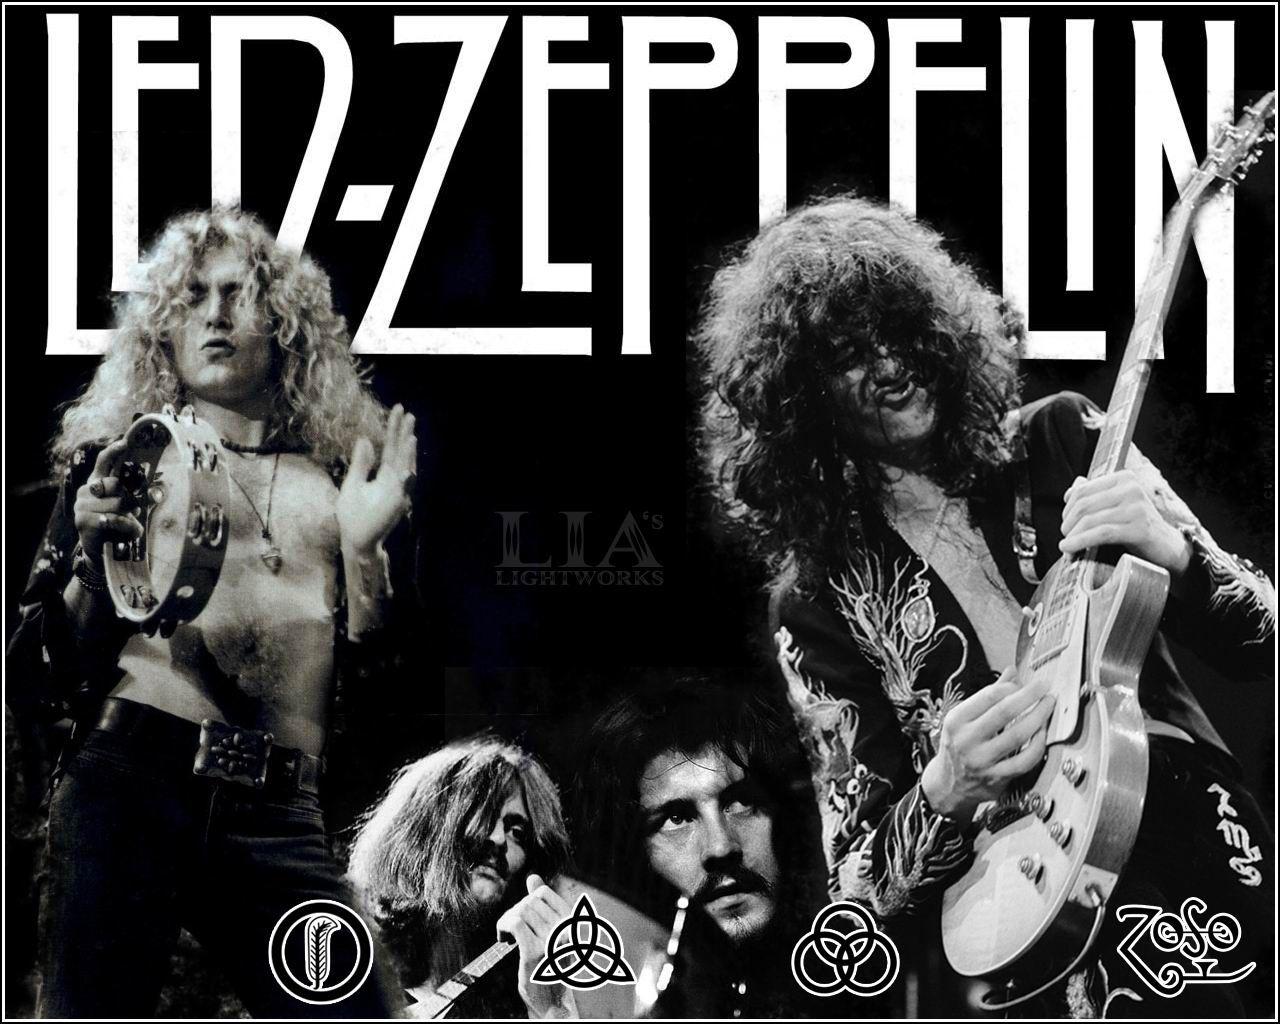 Led zeppelin glam rock u su rock pinterest led and led zeppelin